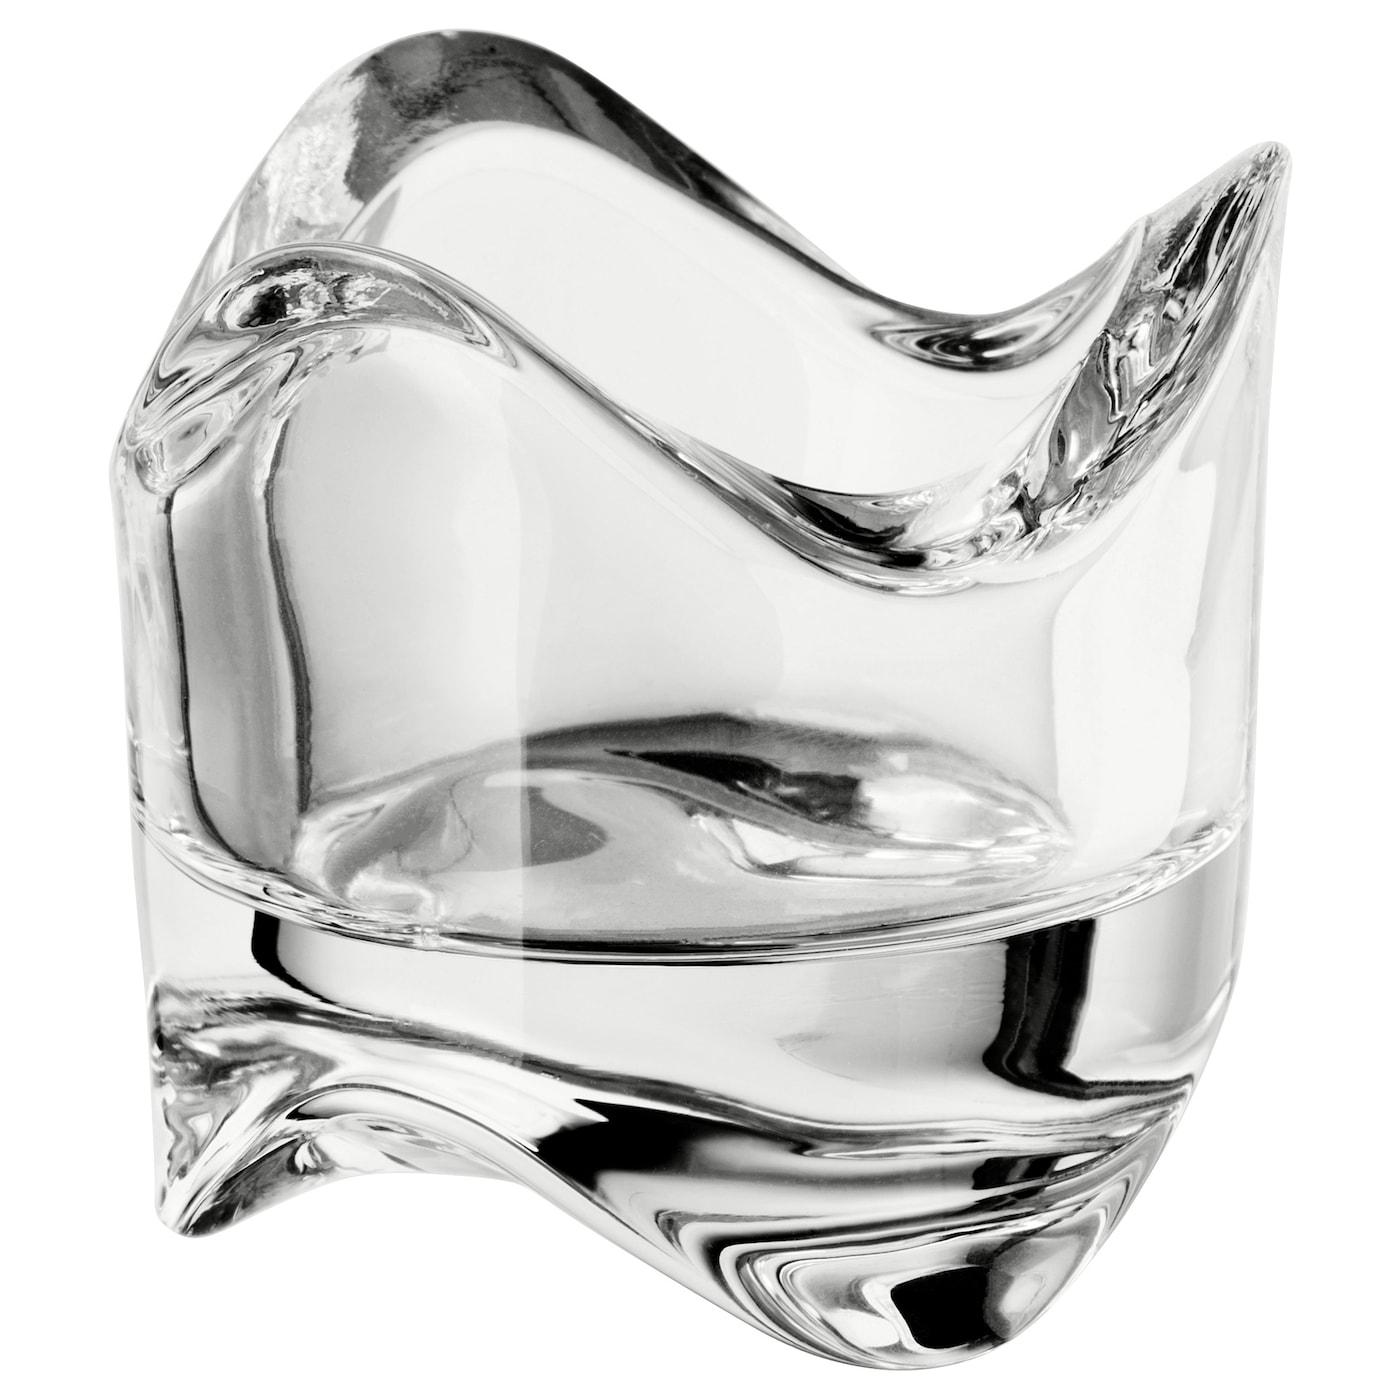 Clear 6x6x6cm-Candle Glass//Tea Light Glass Inna Glass Tealight Holder Levi